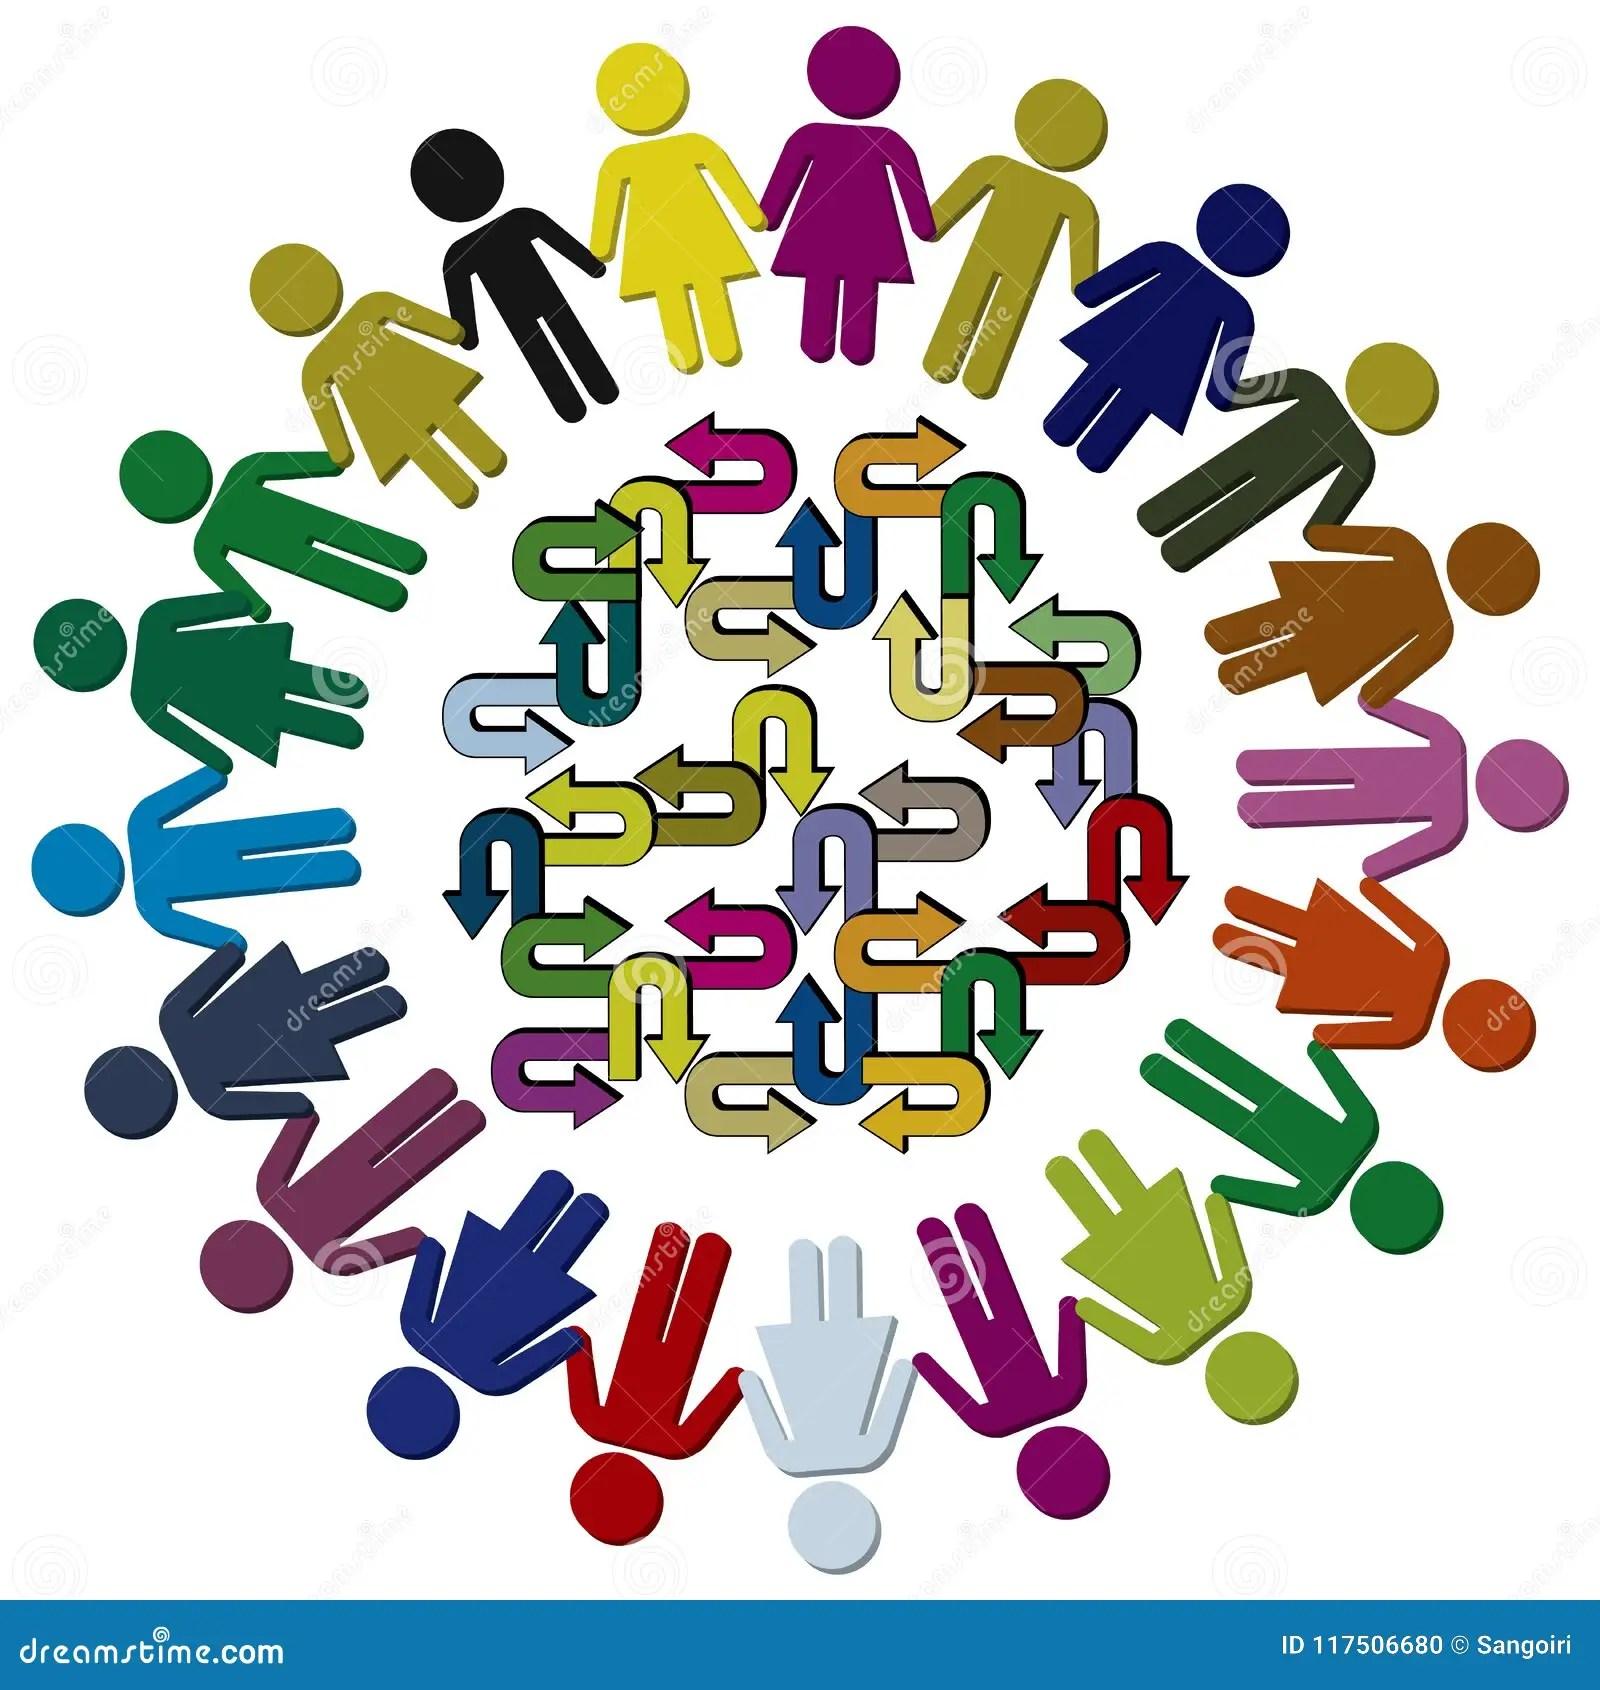 Cultural Diversity Of Children Stock Illustration